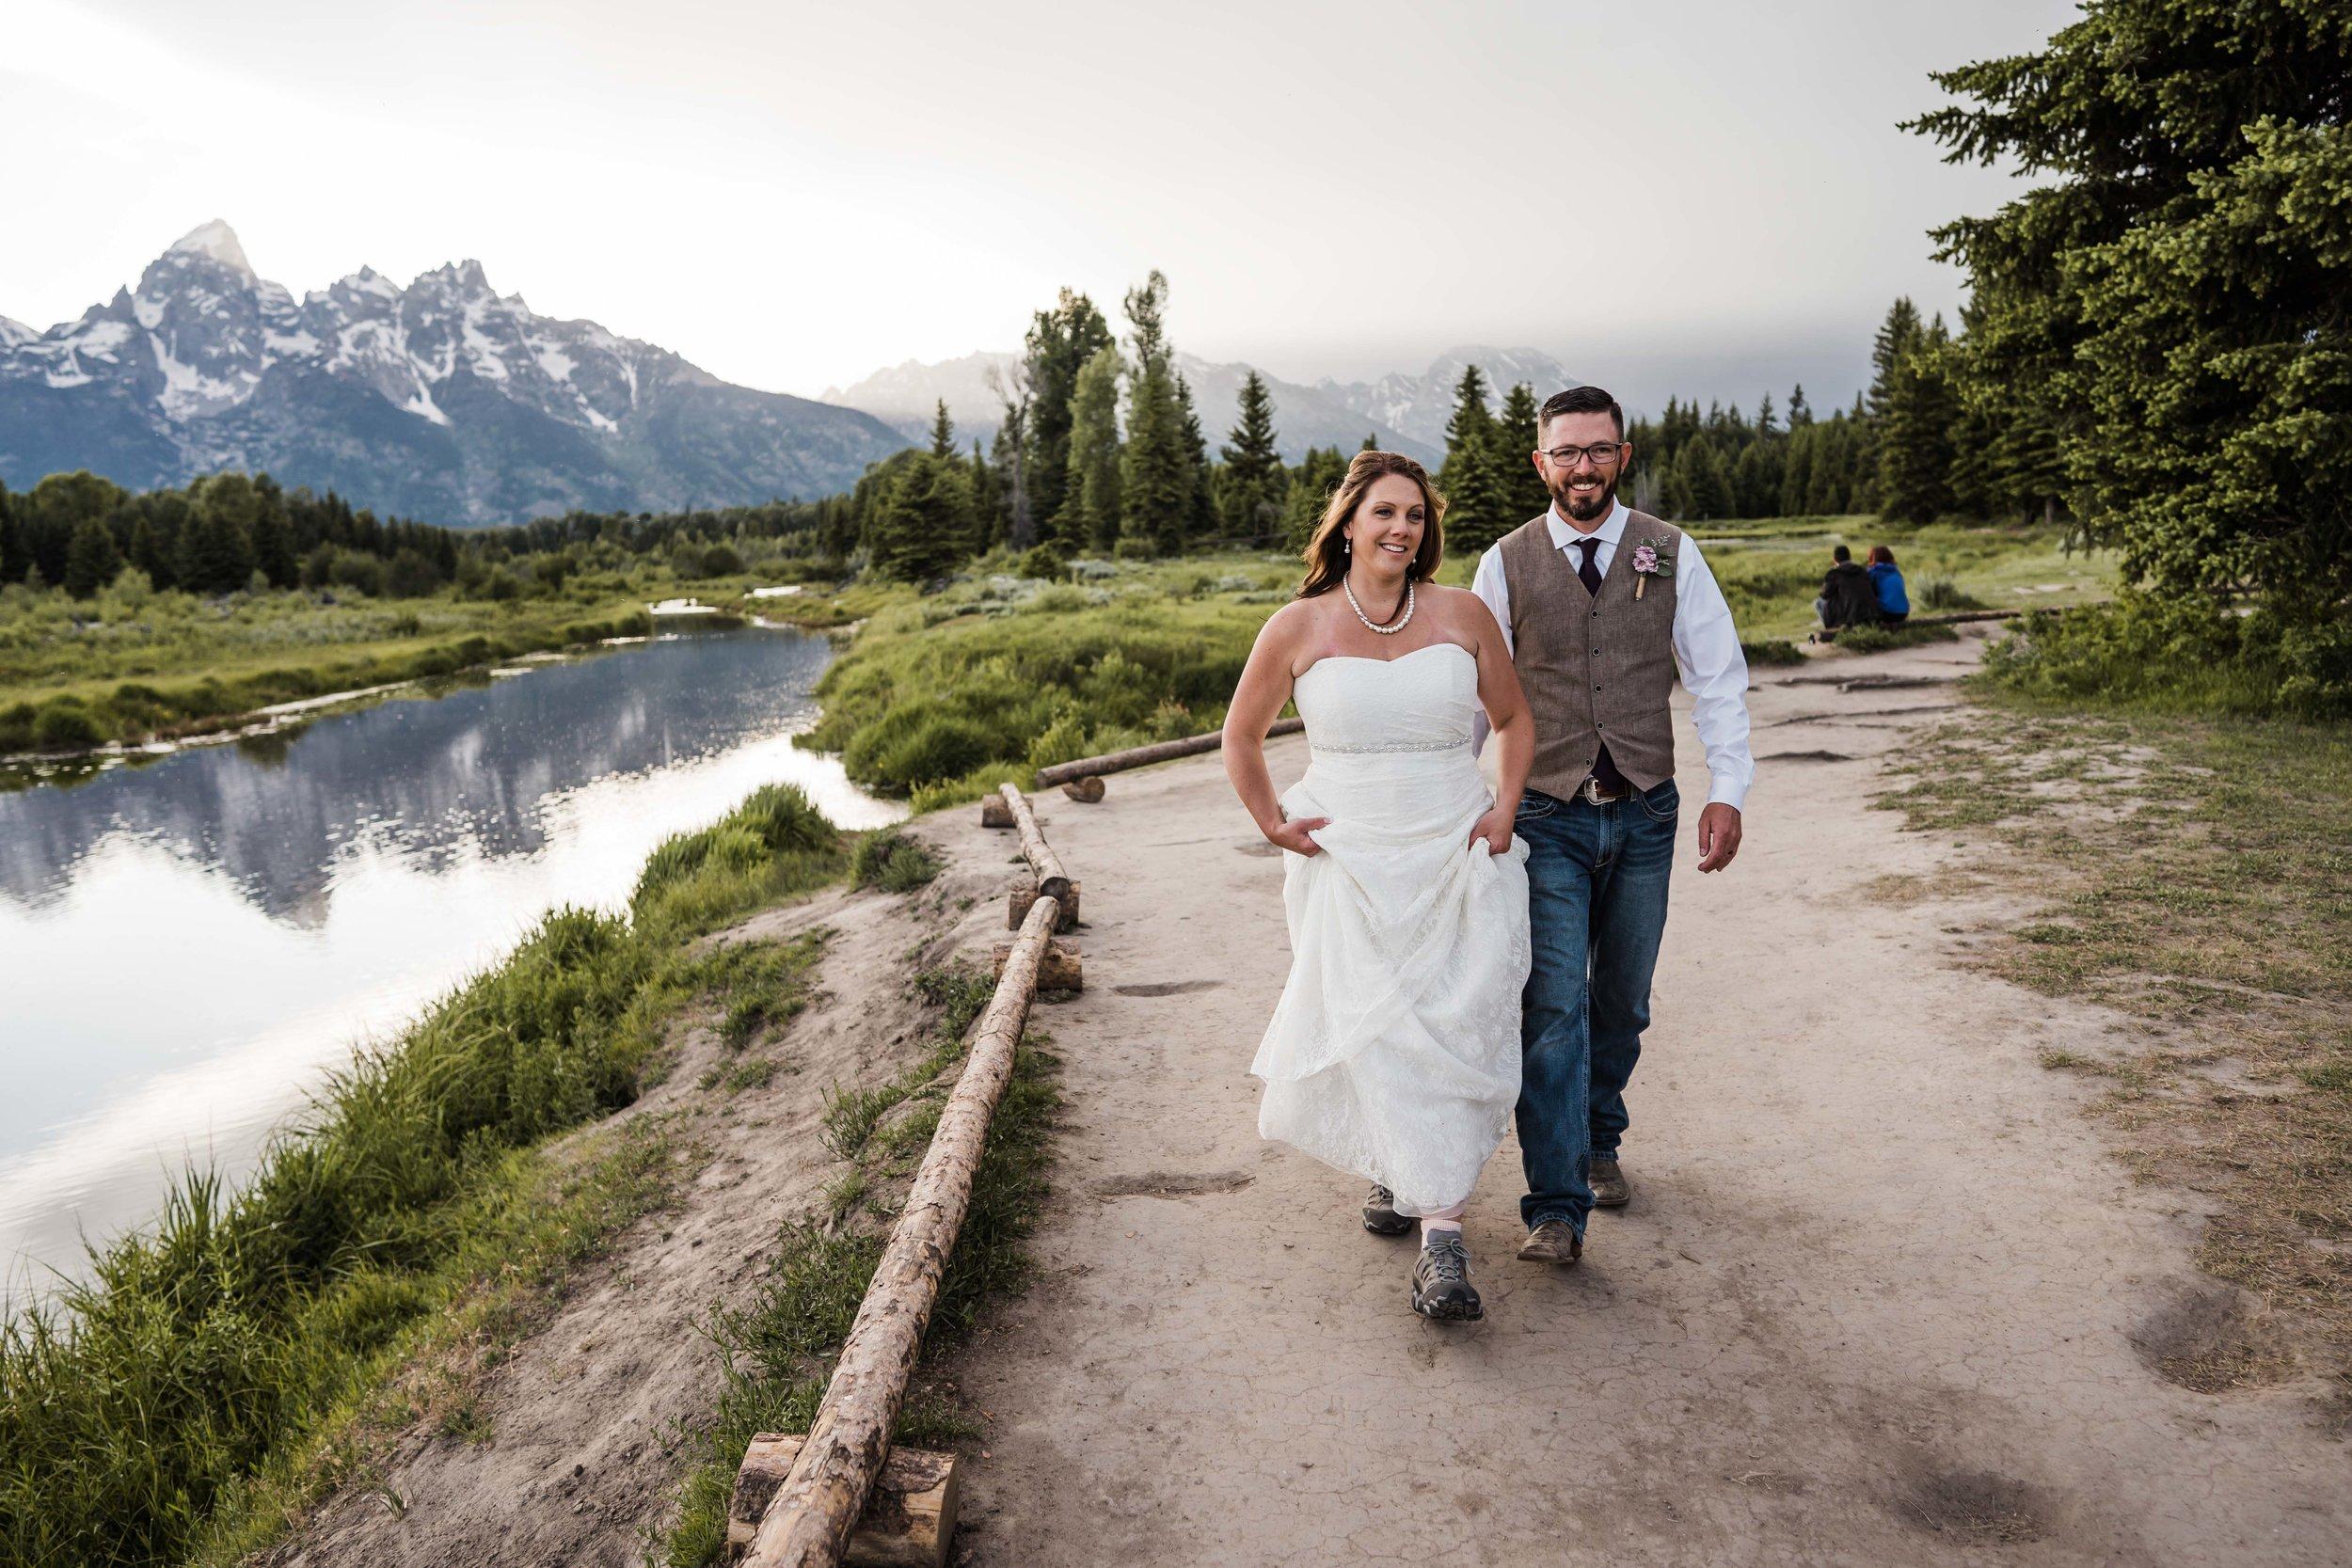 jackson hole adventure wedding photography at schwabachers landing in GTNP -DSD02016.jpg